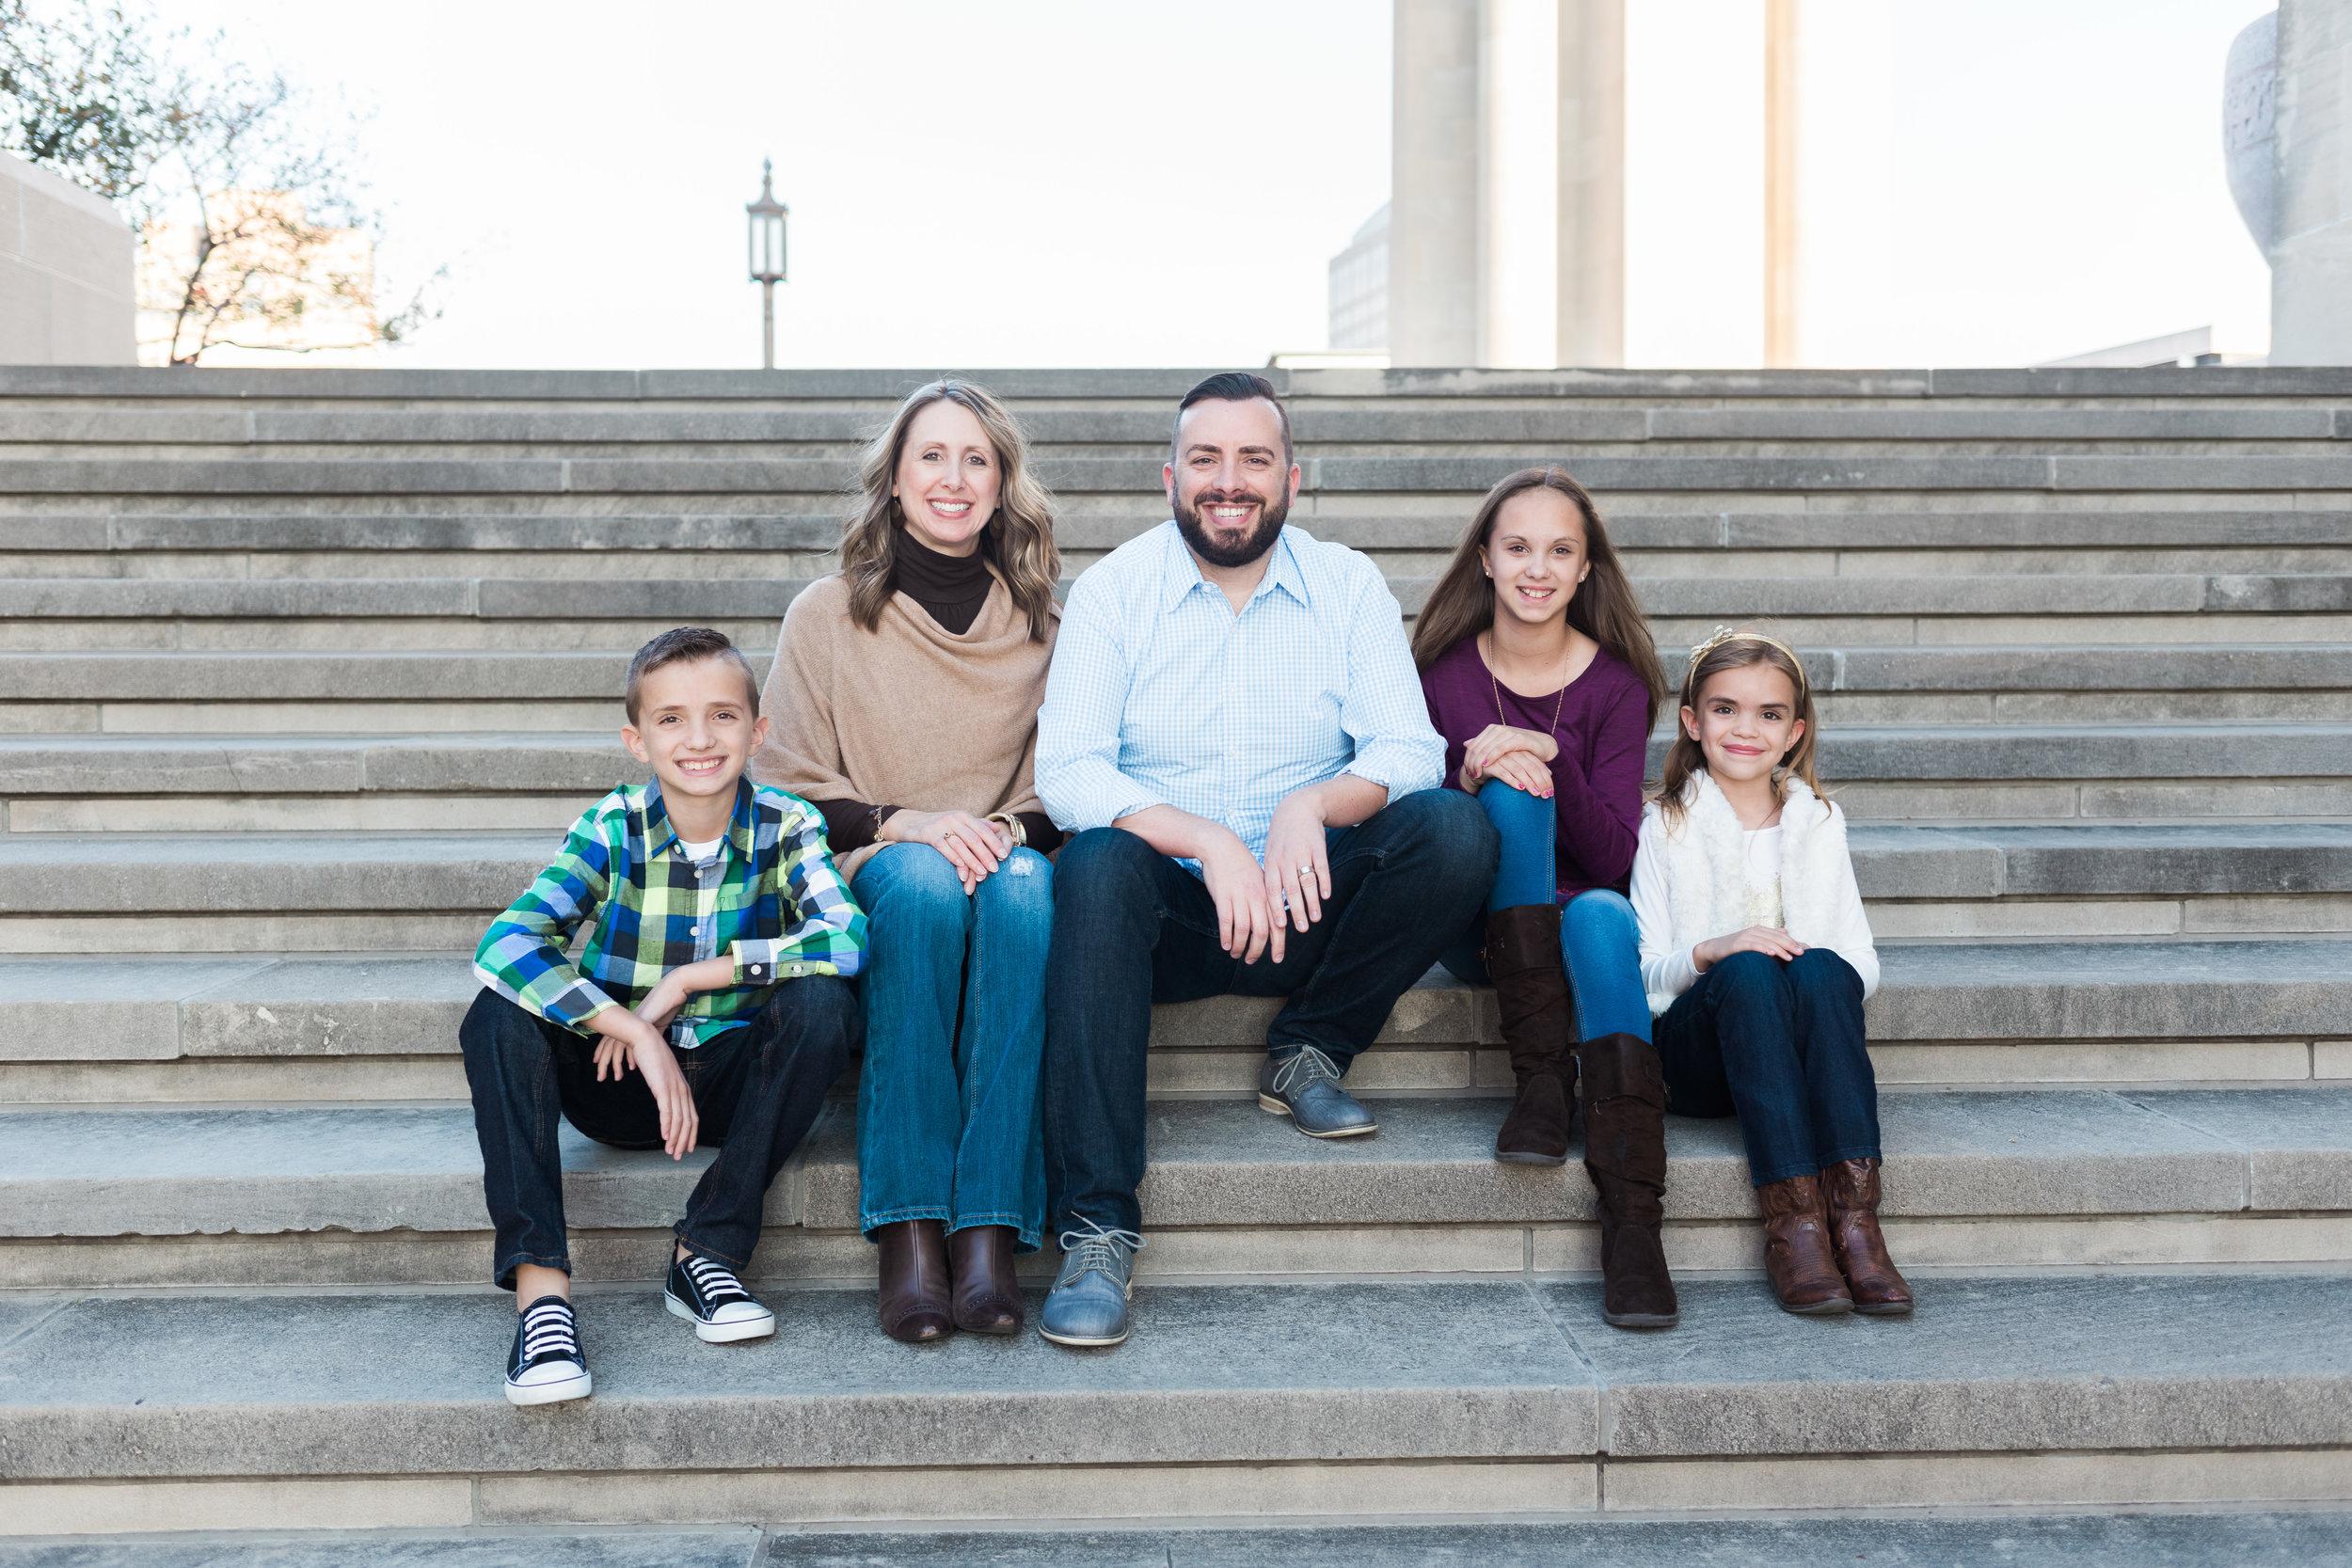 Downtown Kansas City Family Photos__MG_6832-1.jpg